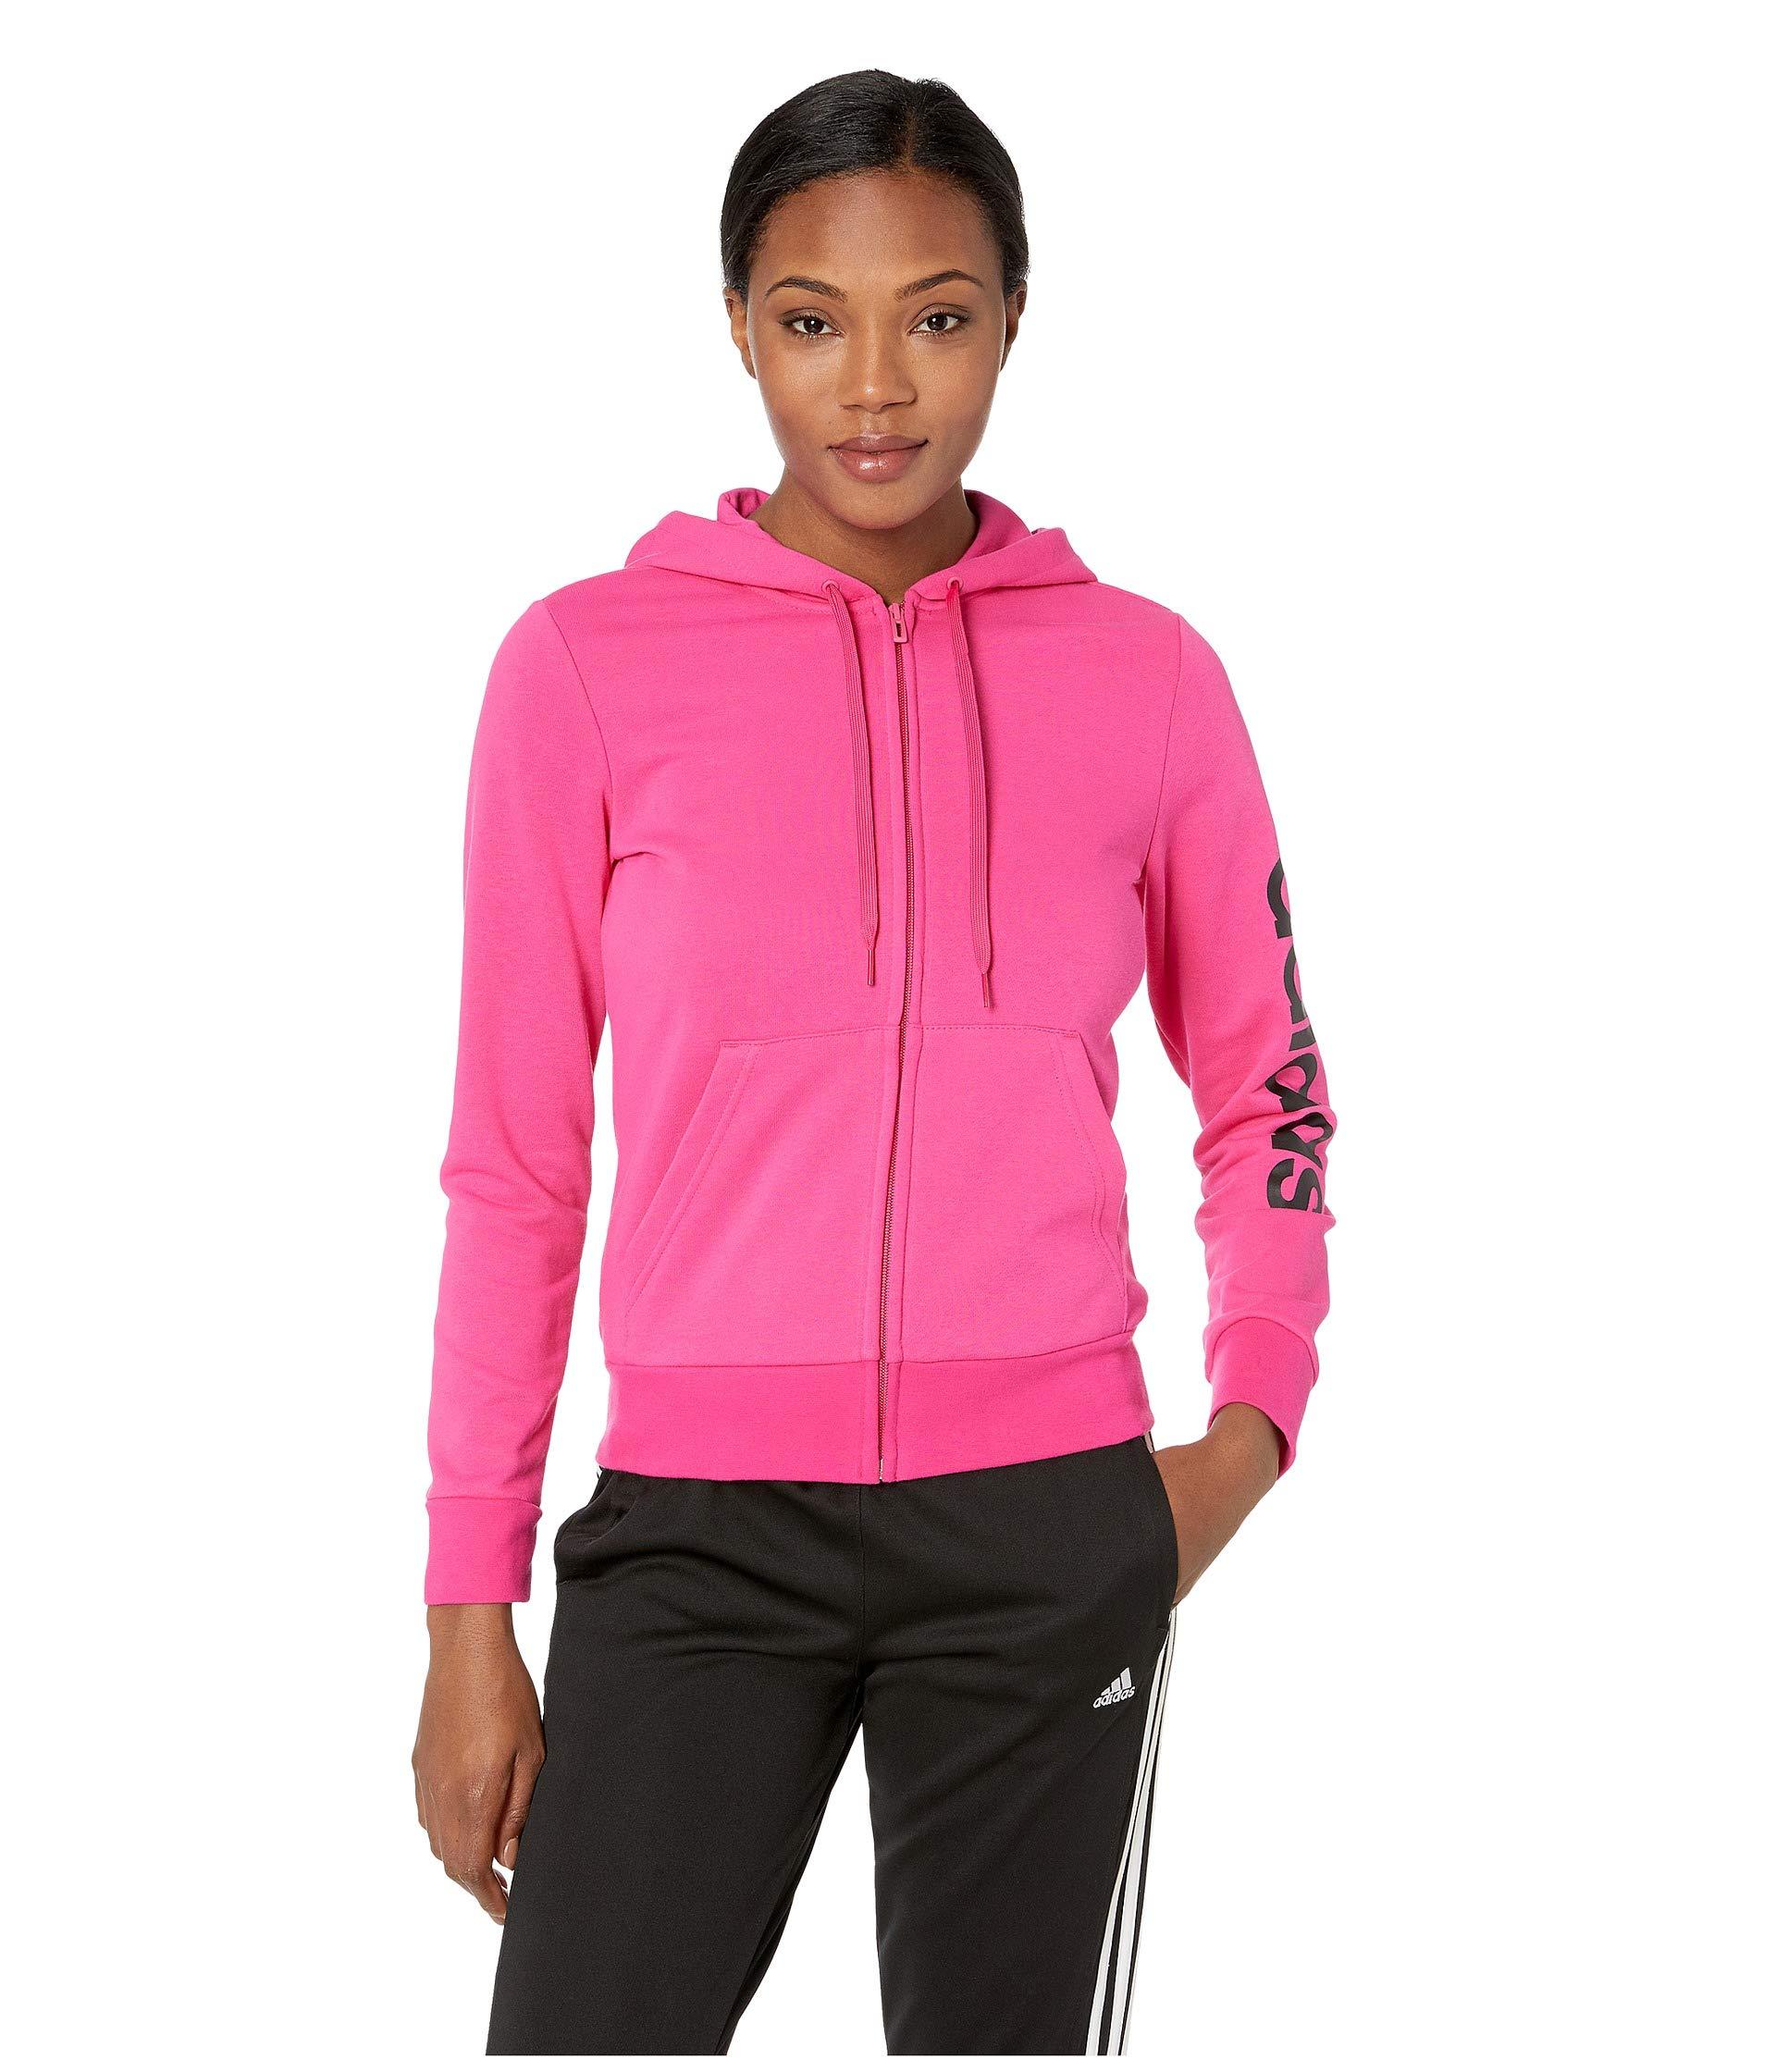 adidas Women's Essentials Linear Full-Zip Hoodie, Real Magenta/Black, Large by adidas